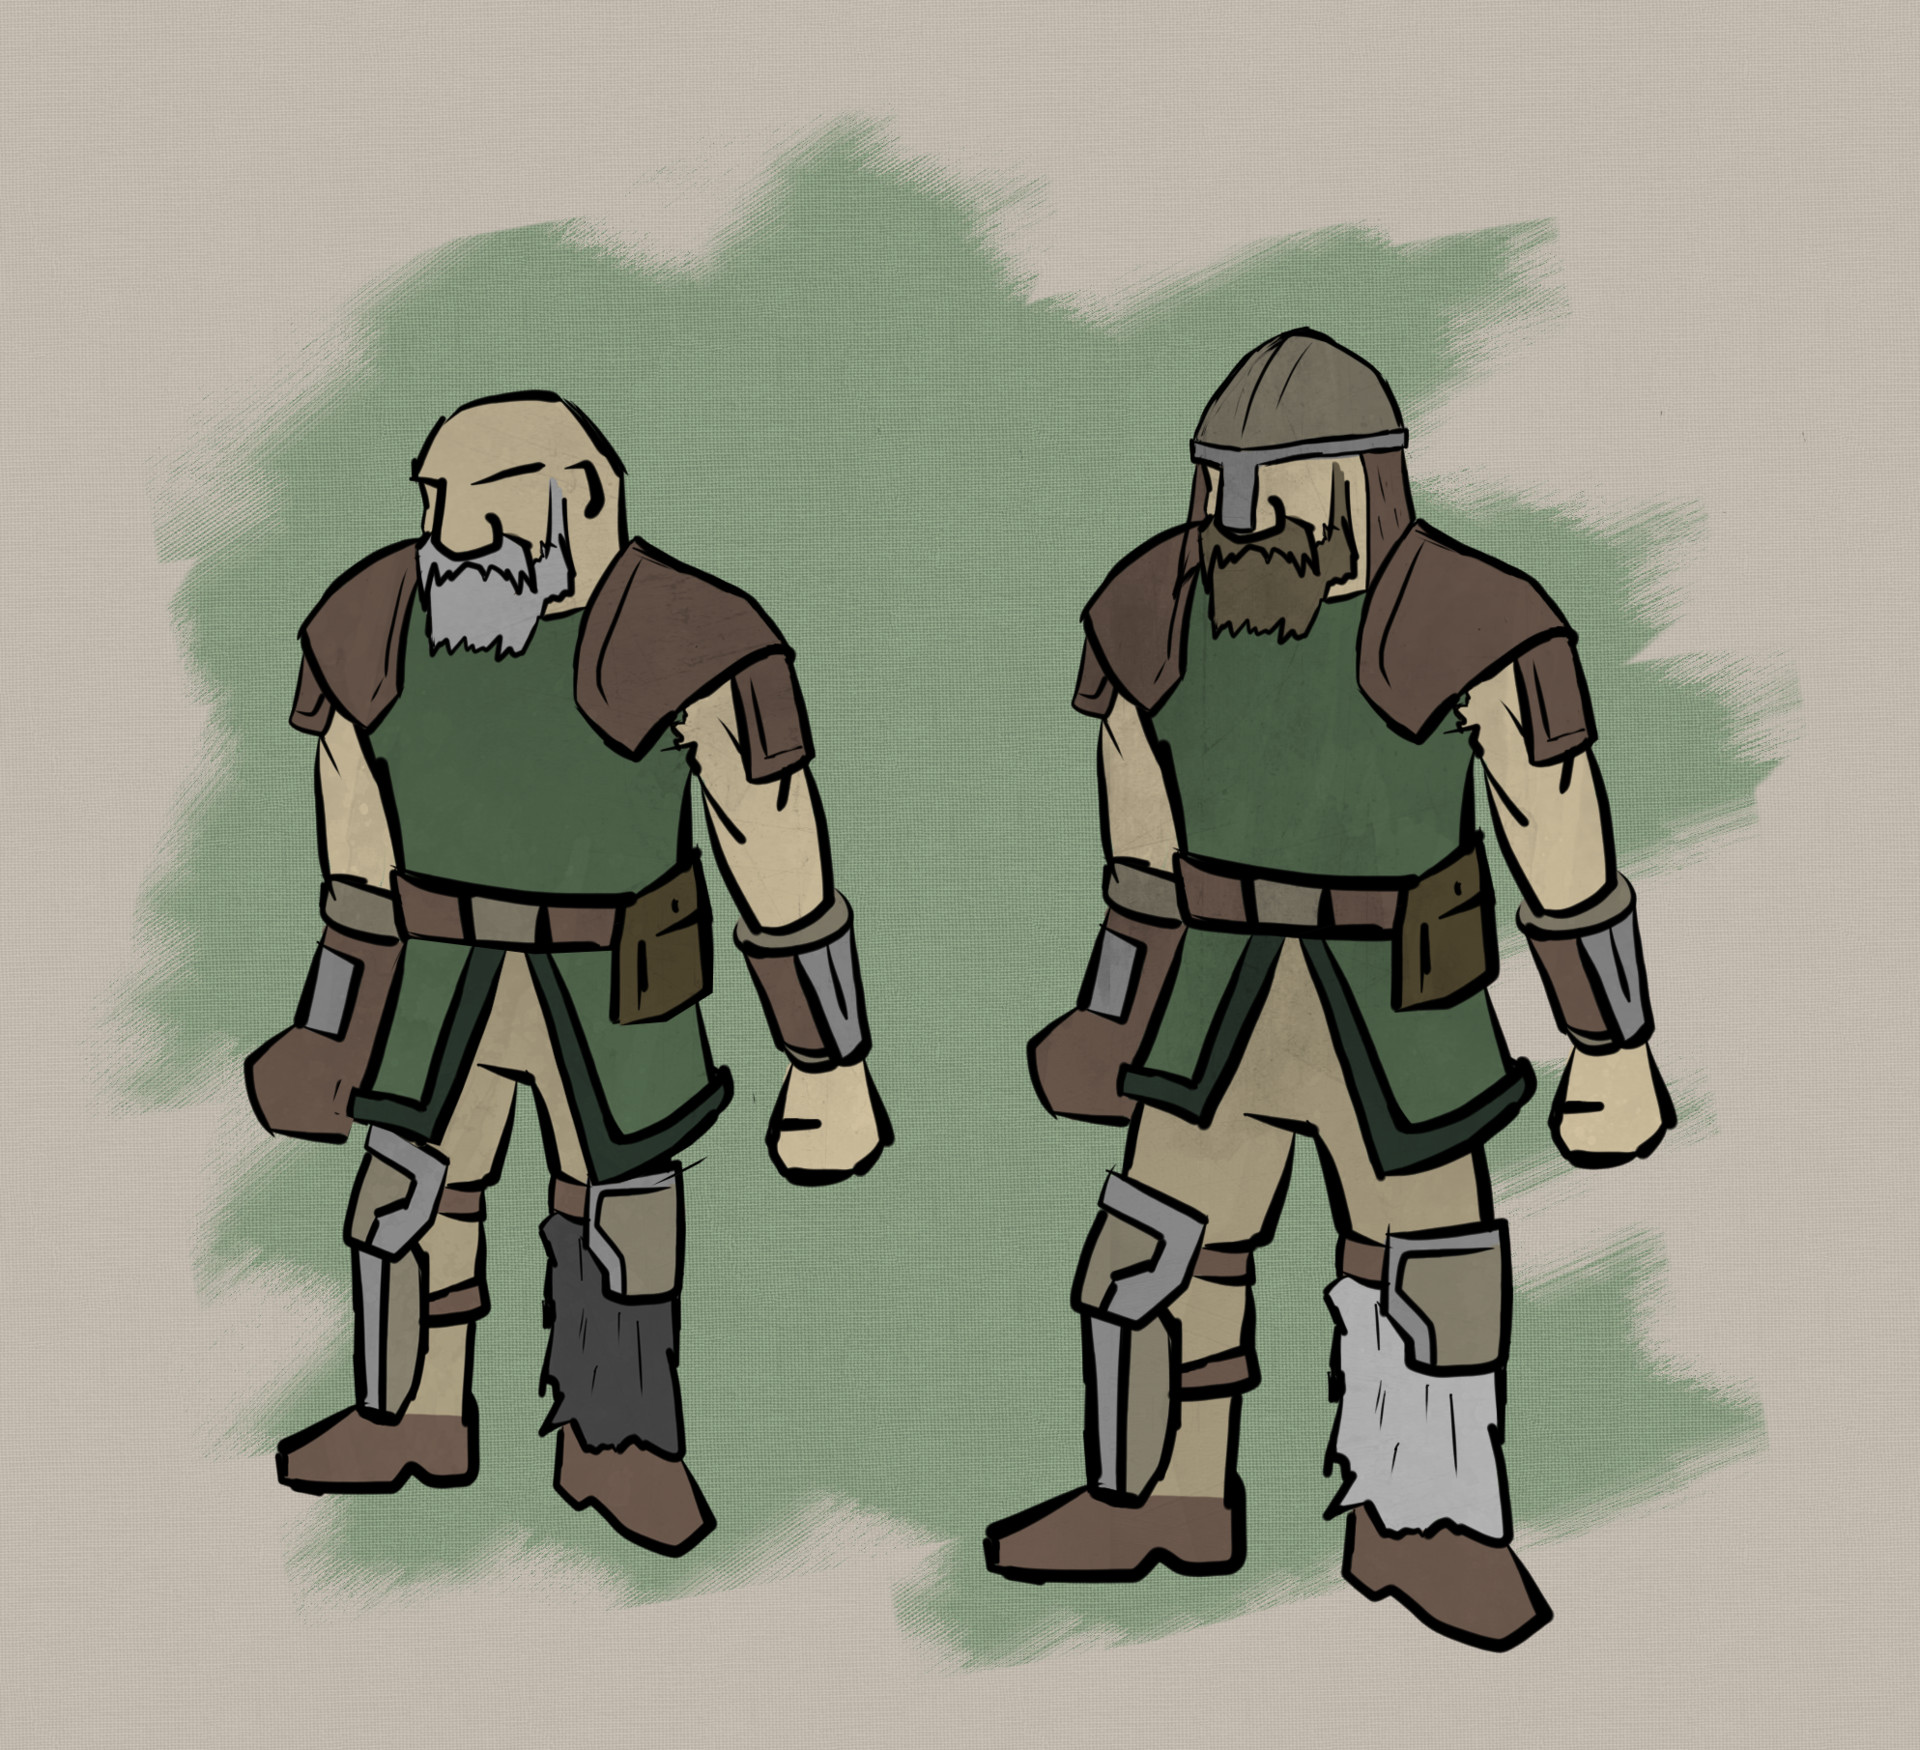 Mat rayner vikingdistort2